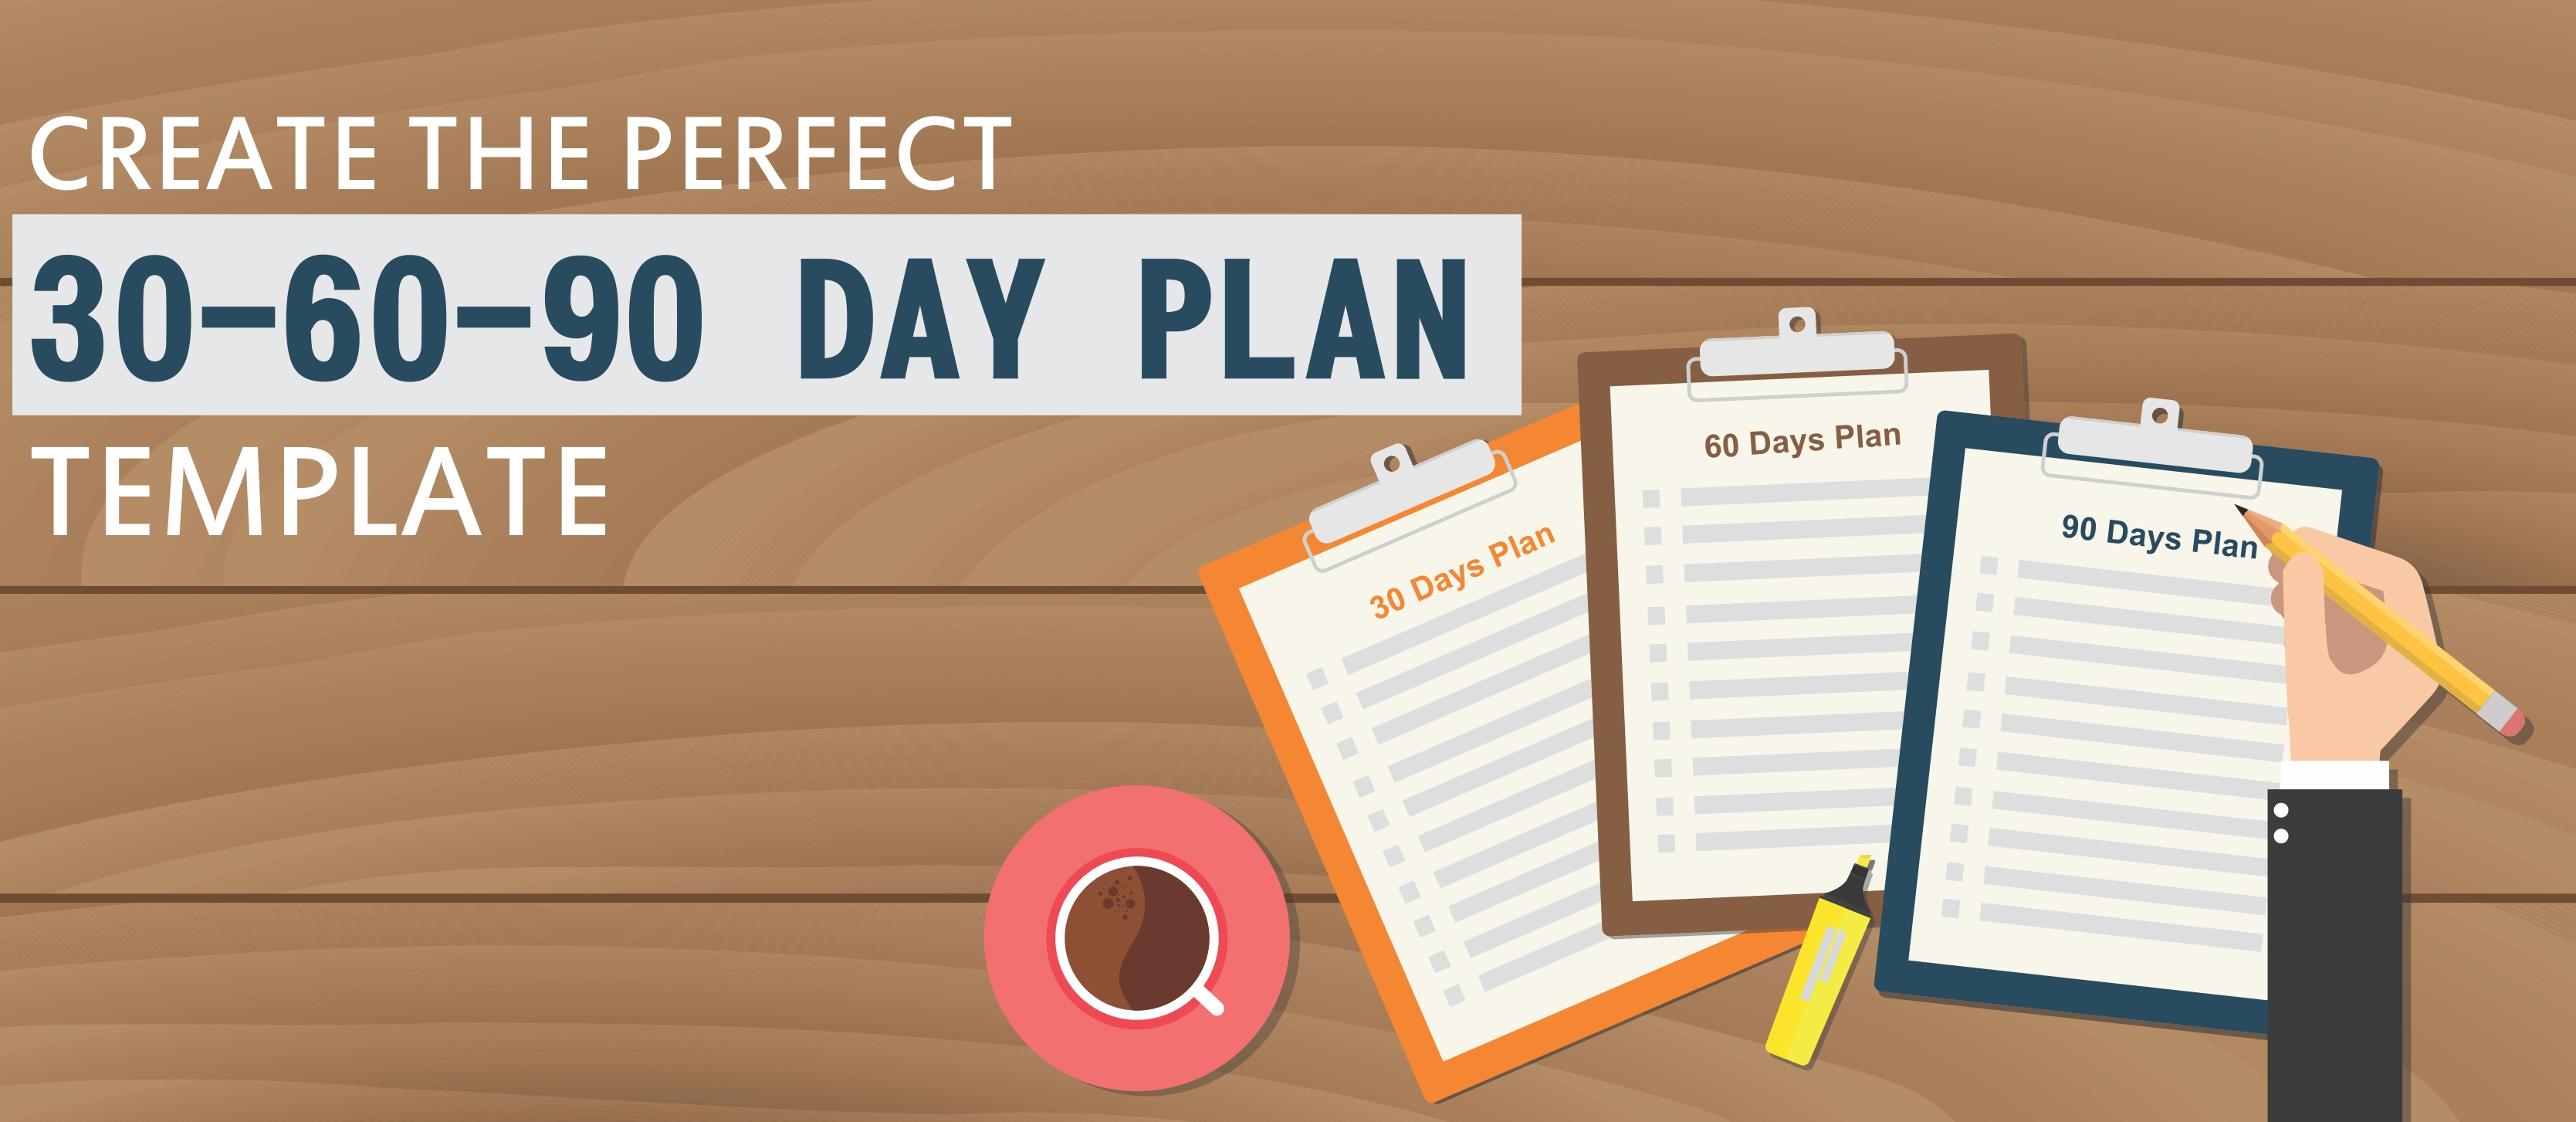 30 60 90 day plan designs that ll help you stay on track the slideteam blog. Black Bedroom Furniture Sets. Home Design Ideas